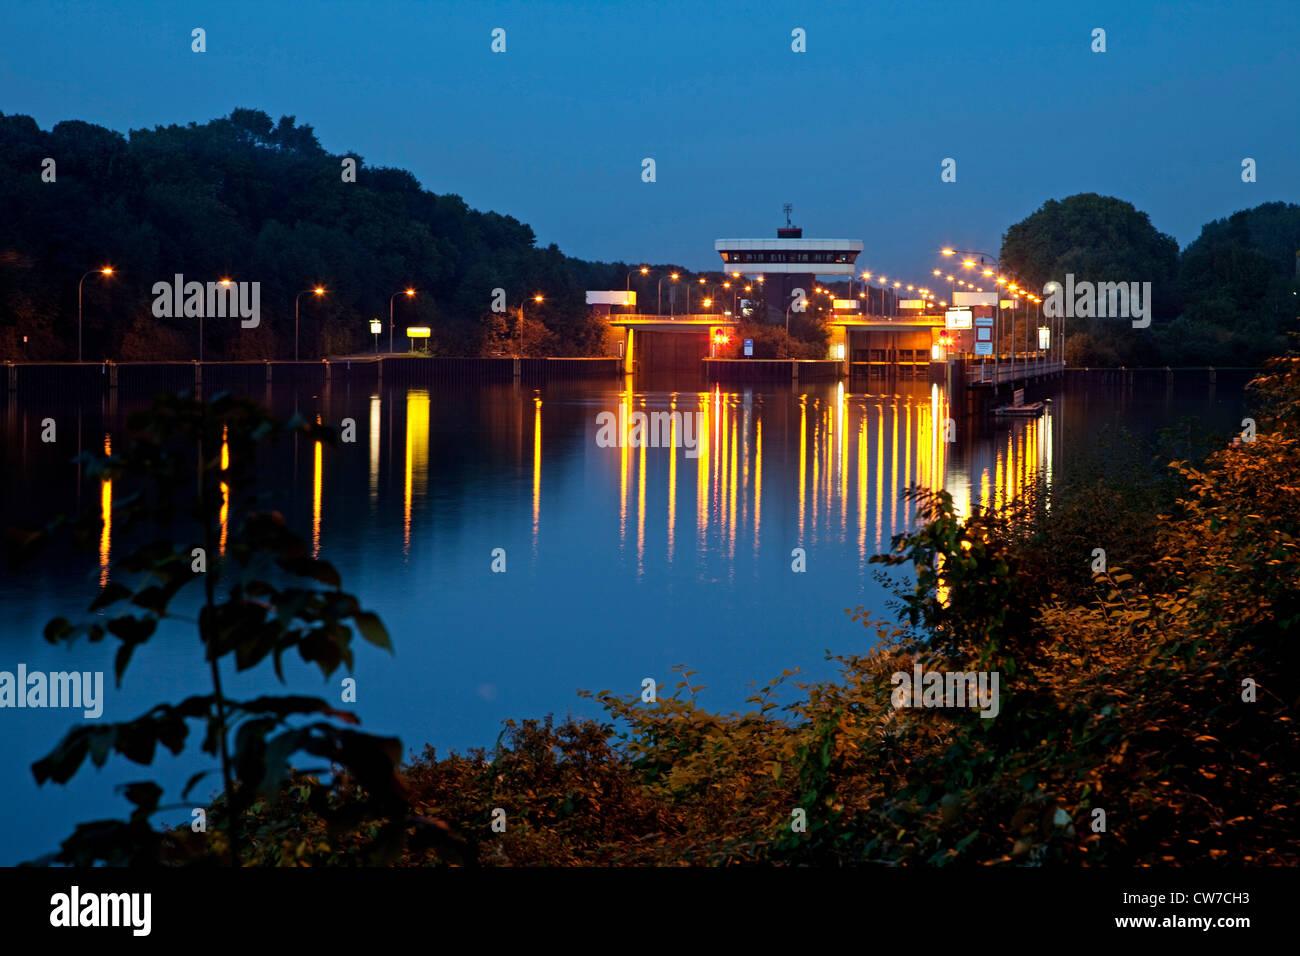 watergate at Rhein Herne chanel in twilight, Germany, North Rhine-Westphalia, Ruhr Area, Gelsenkirchen - Stock Image